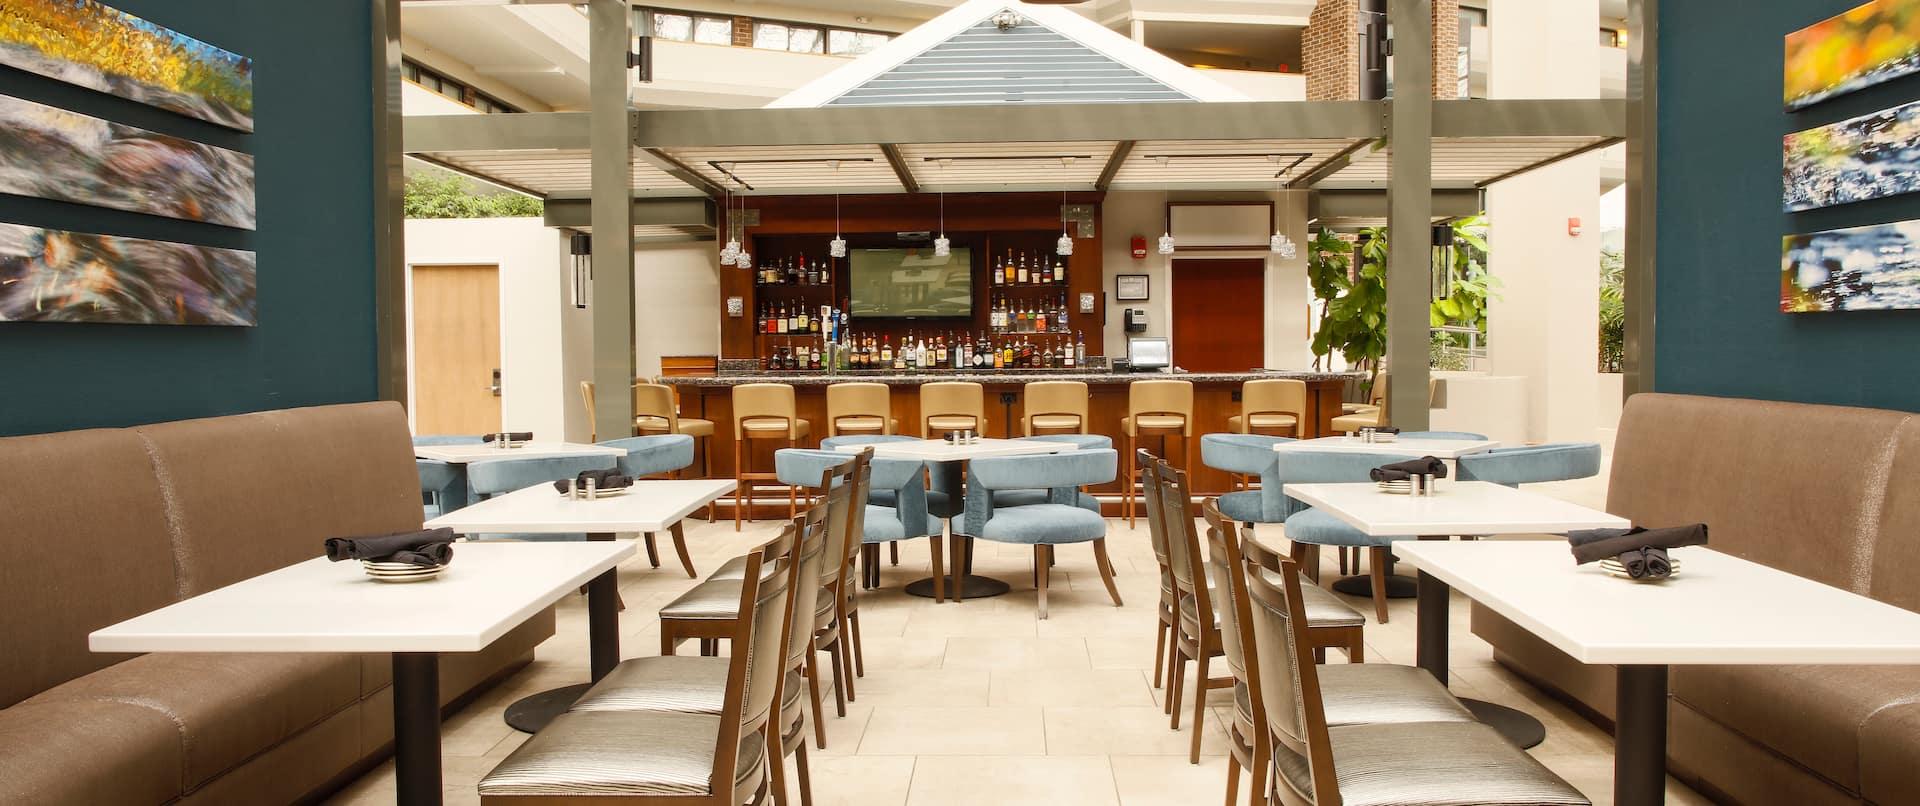 Atrium Lounge Restaurant and Bar